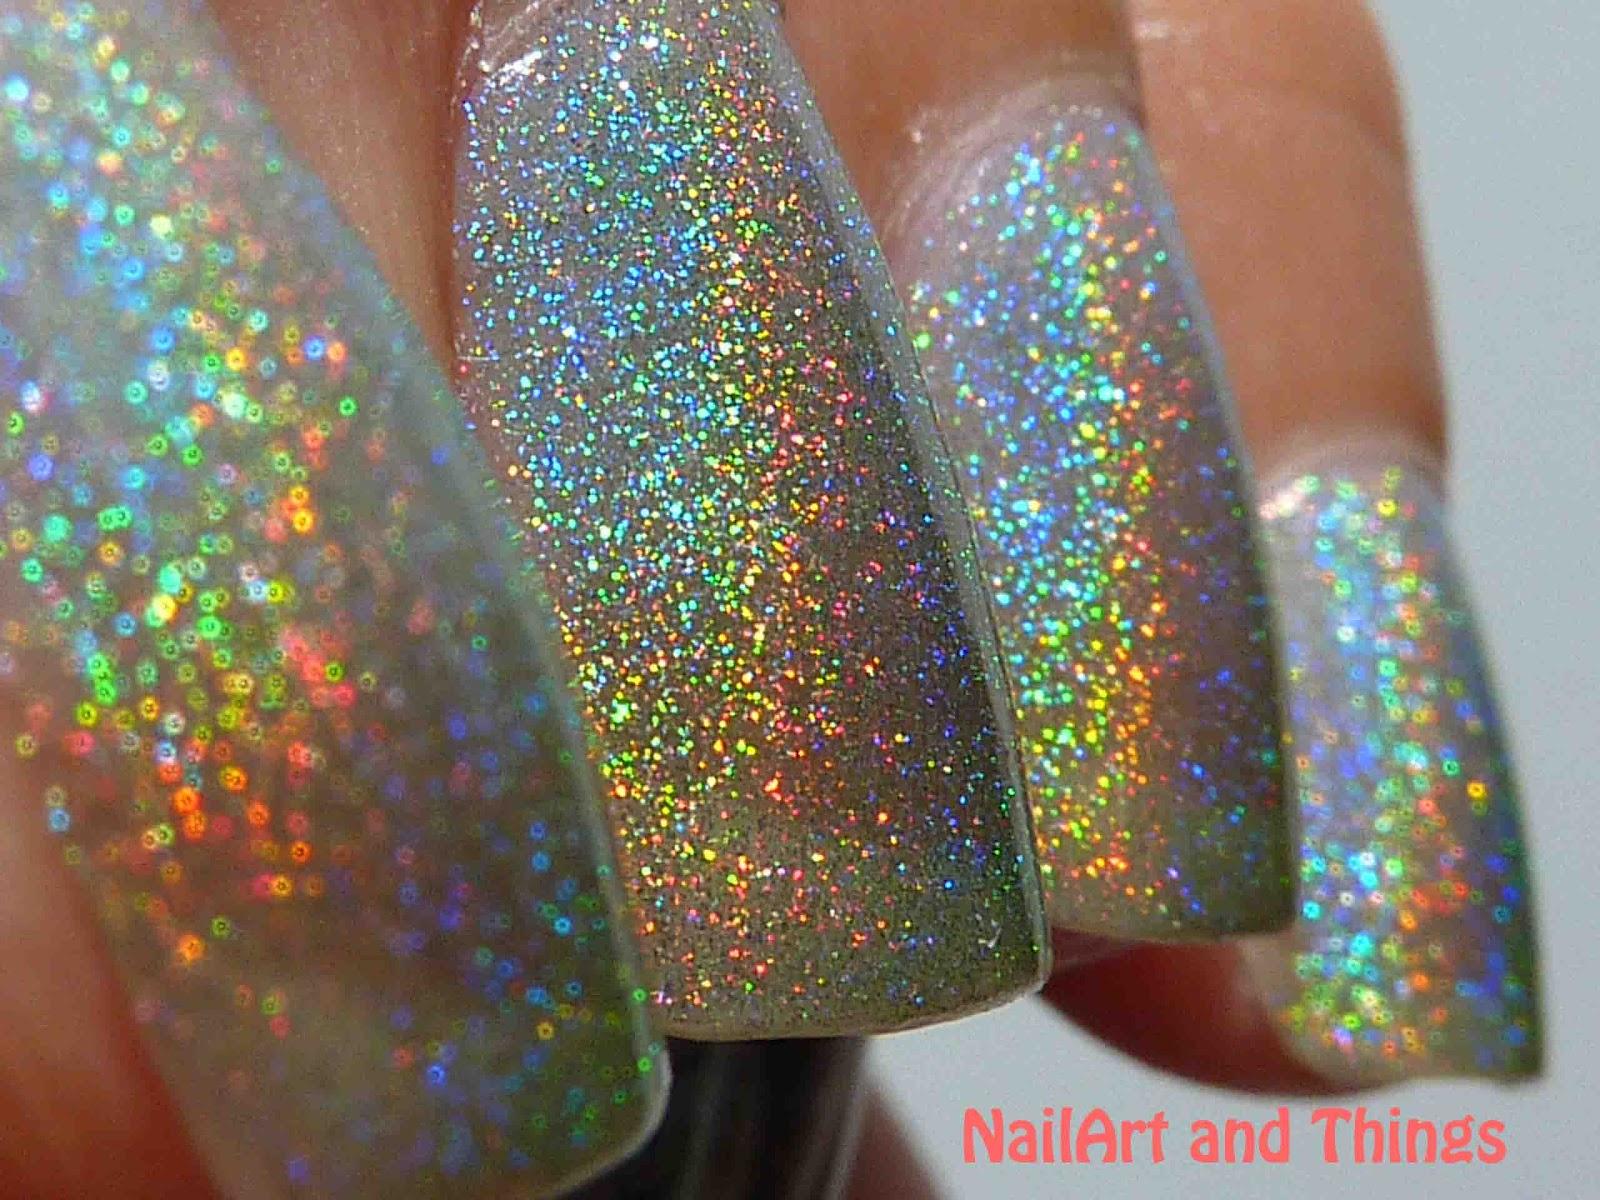 Nailart And Things: NailArt And Things: Holo-ey Grail : Glitter Gal Holo Green